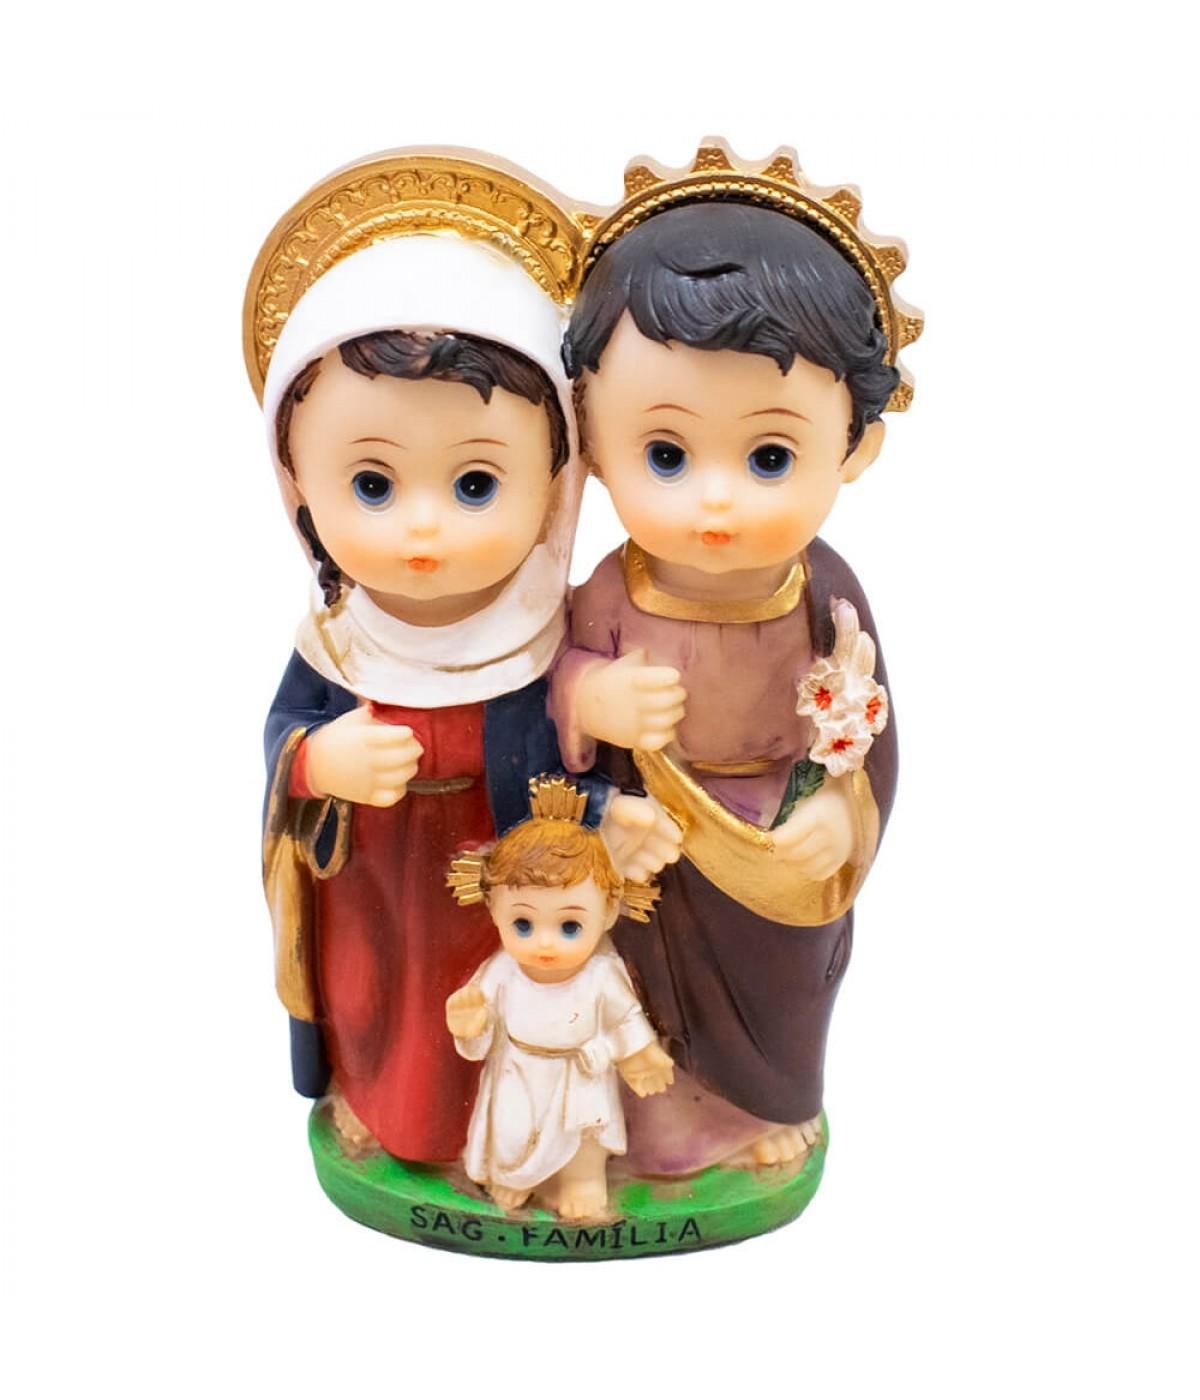 Sagrada Família 13cm Infantil - Enfeite Resina